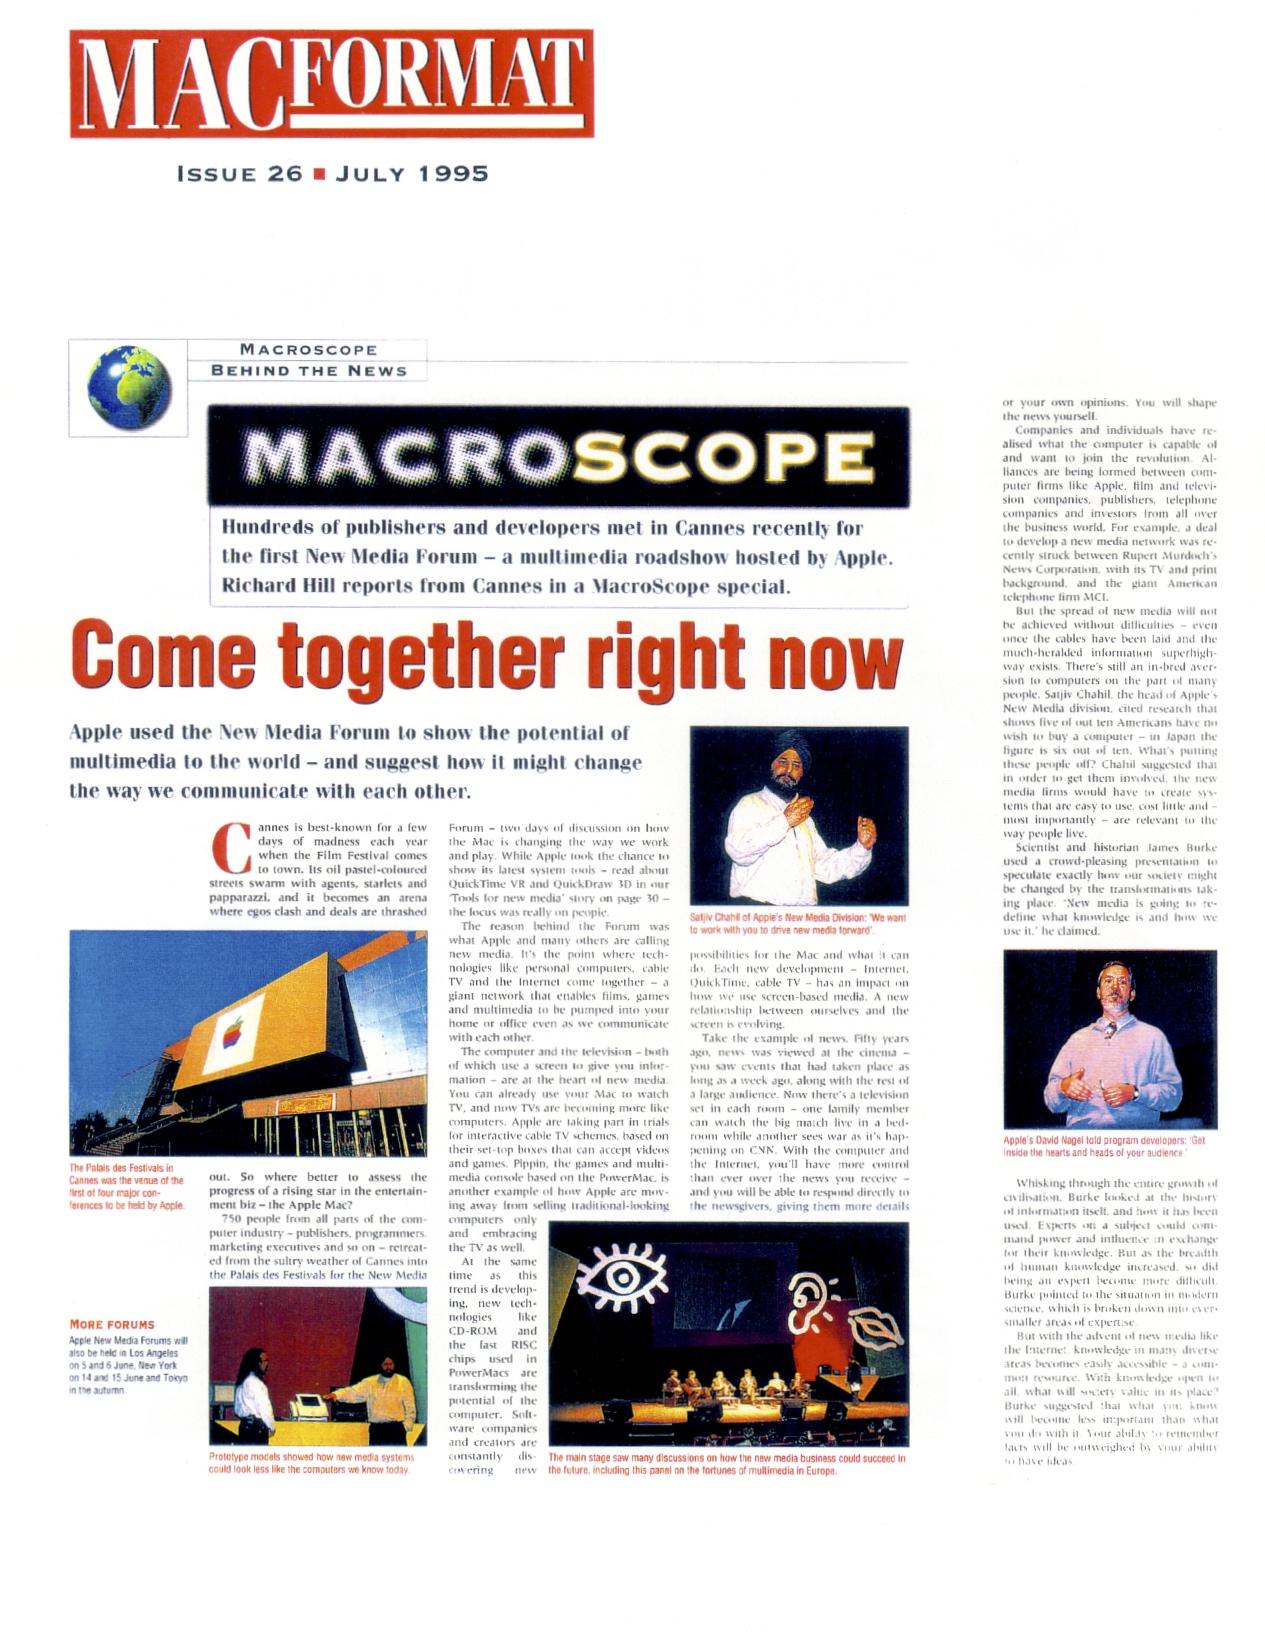 (1995) MACFormat Cannes